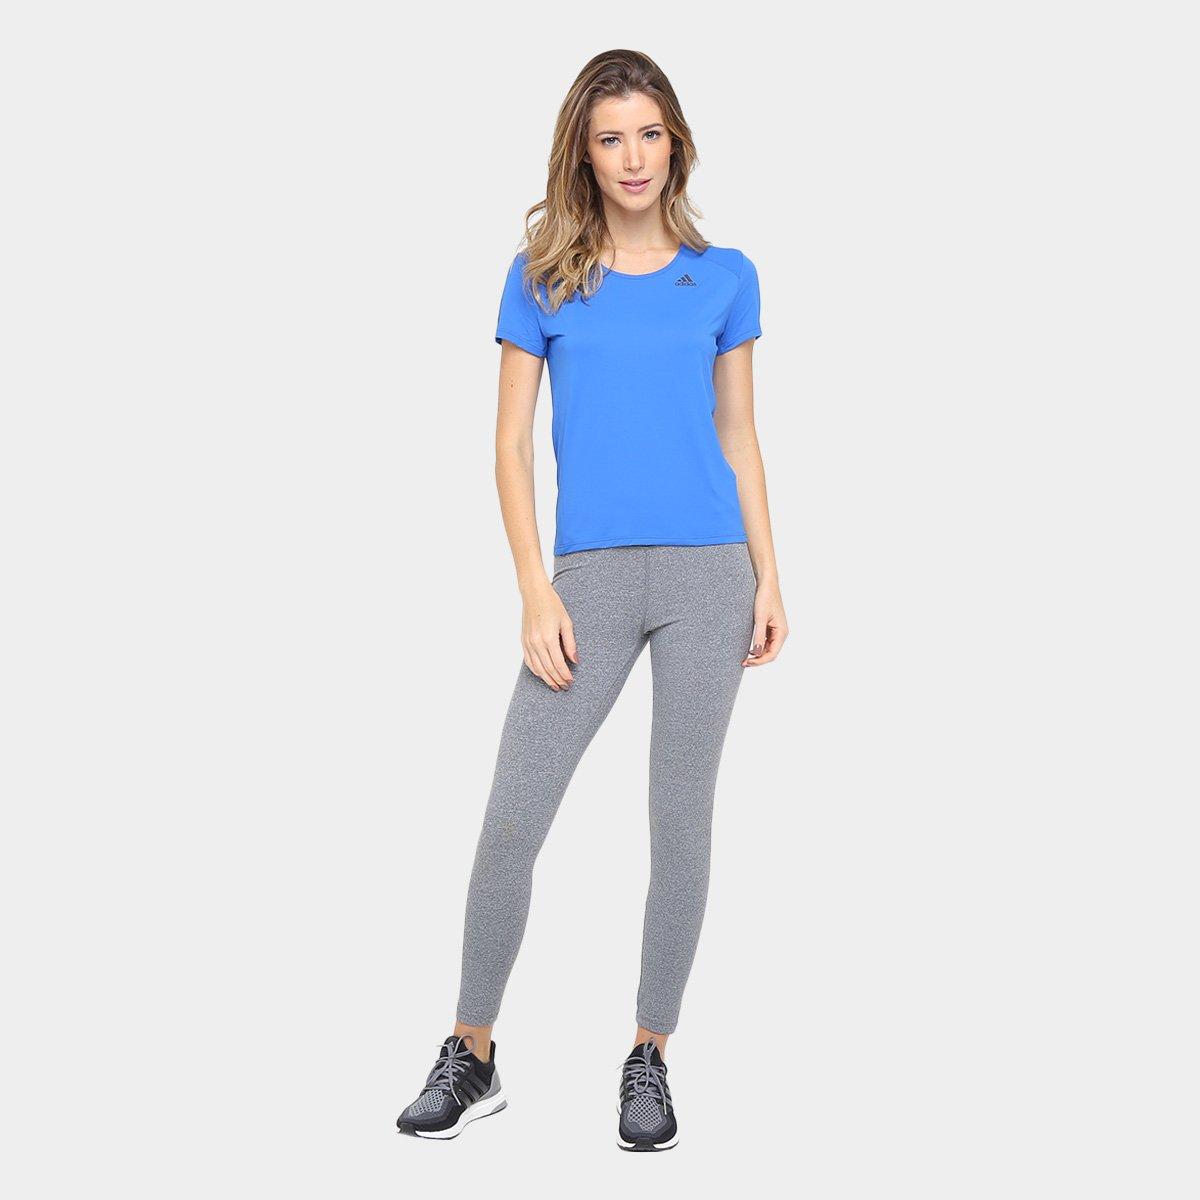 Camiseta Camiseta Adidas Feminina Azul Adidas Response Poliamida 11qHSTn5